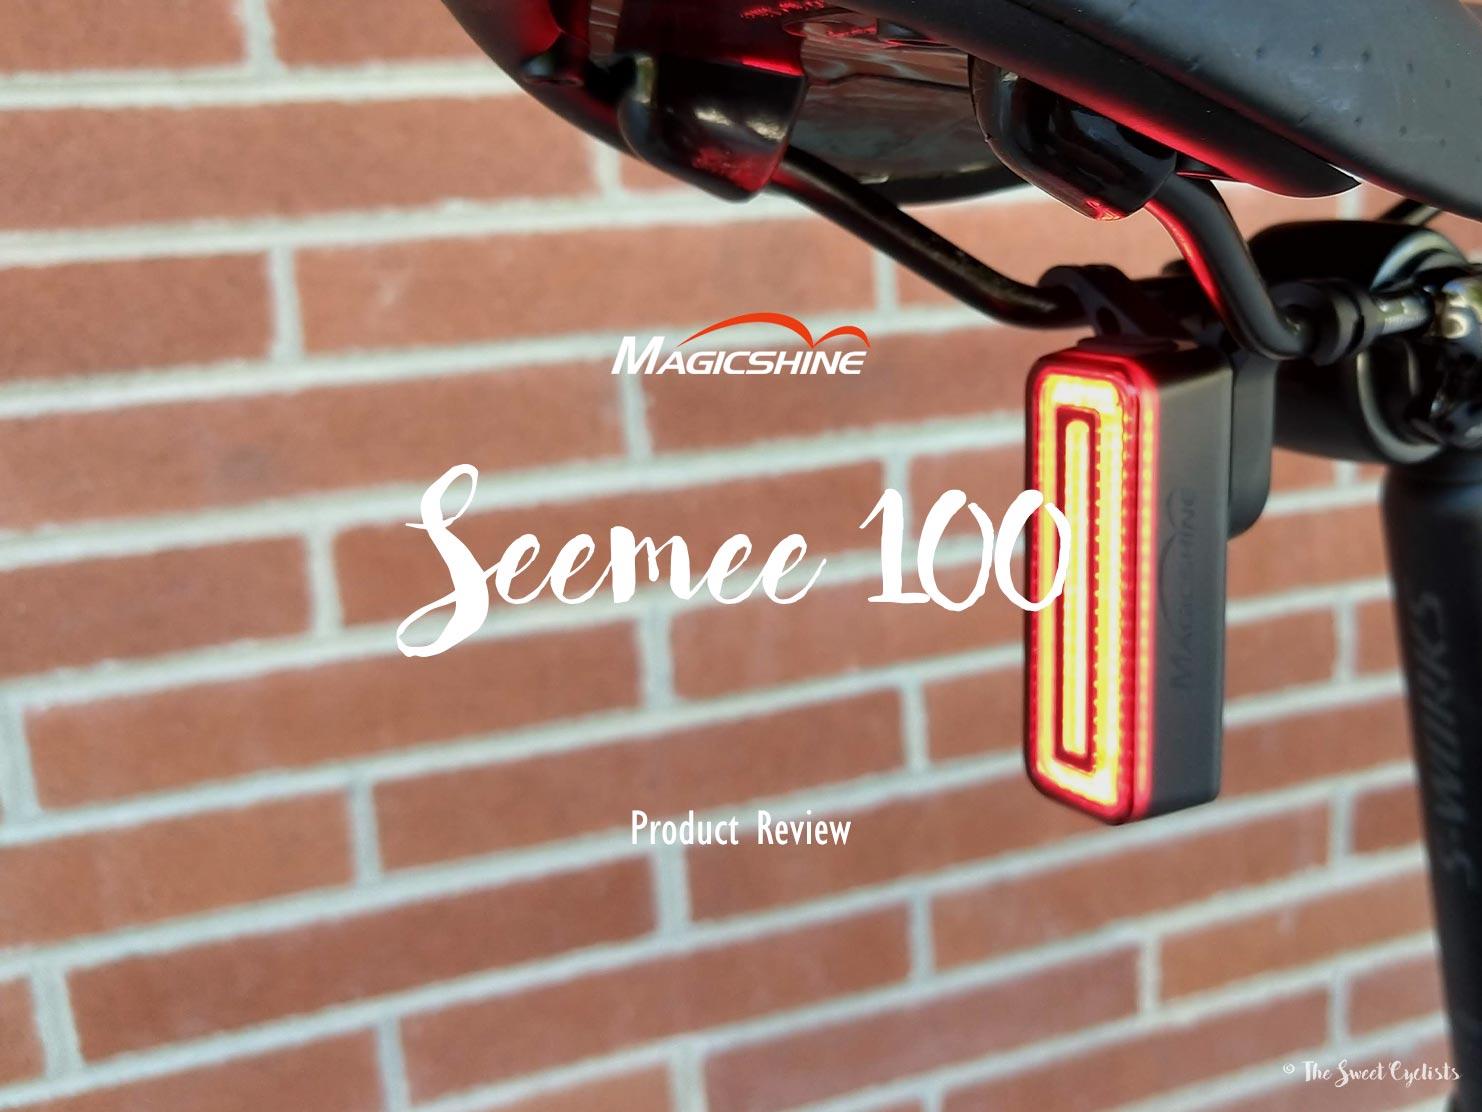 Magicshine Seemee 100, an affordable smart tail light